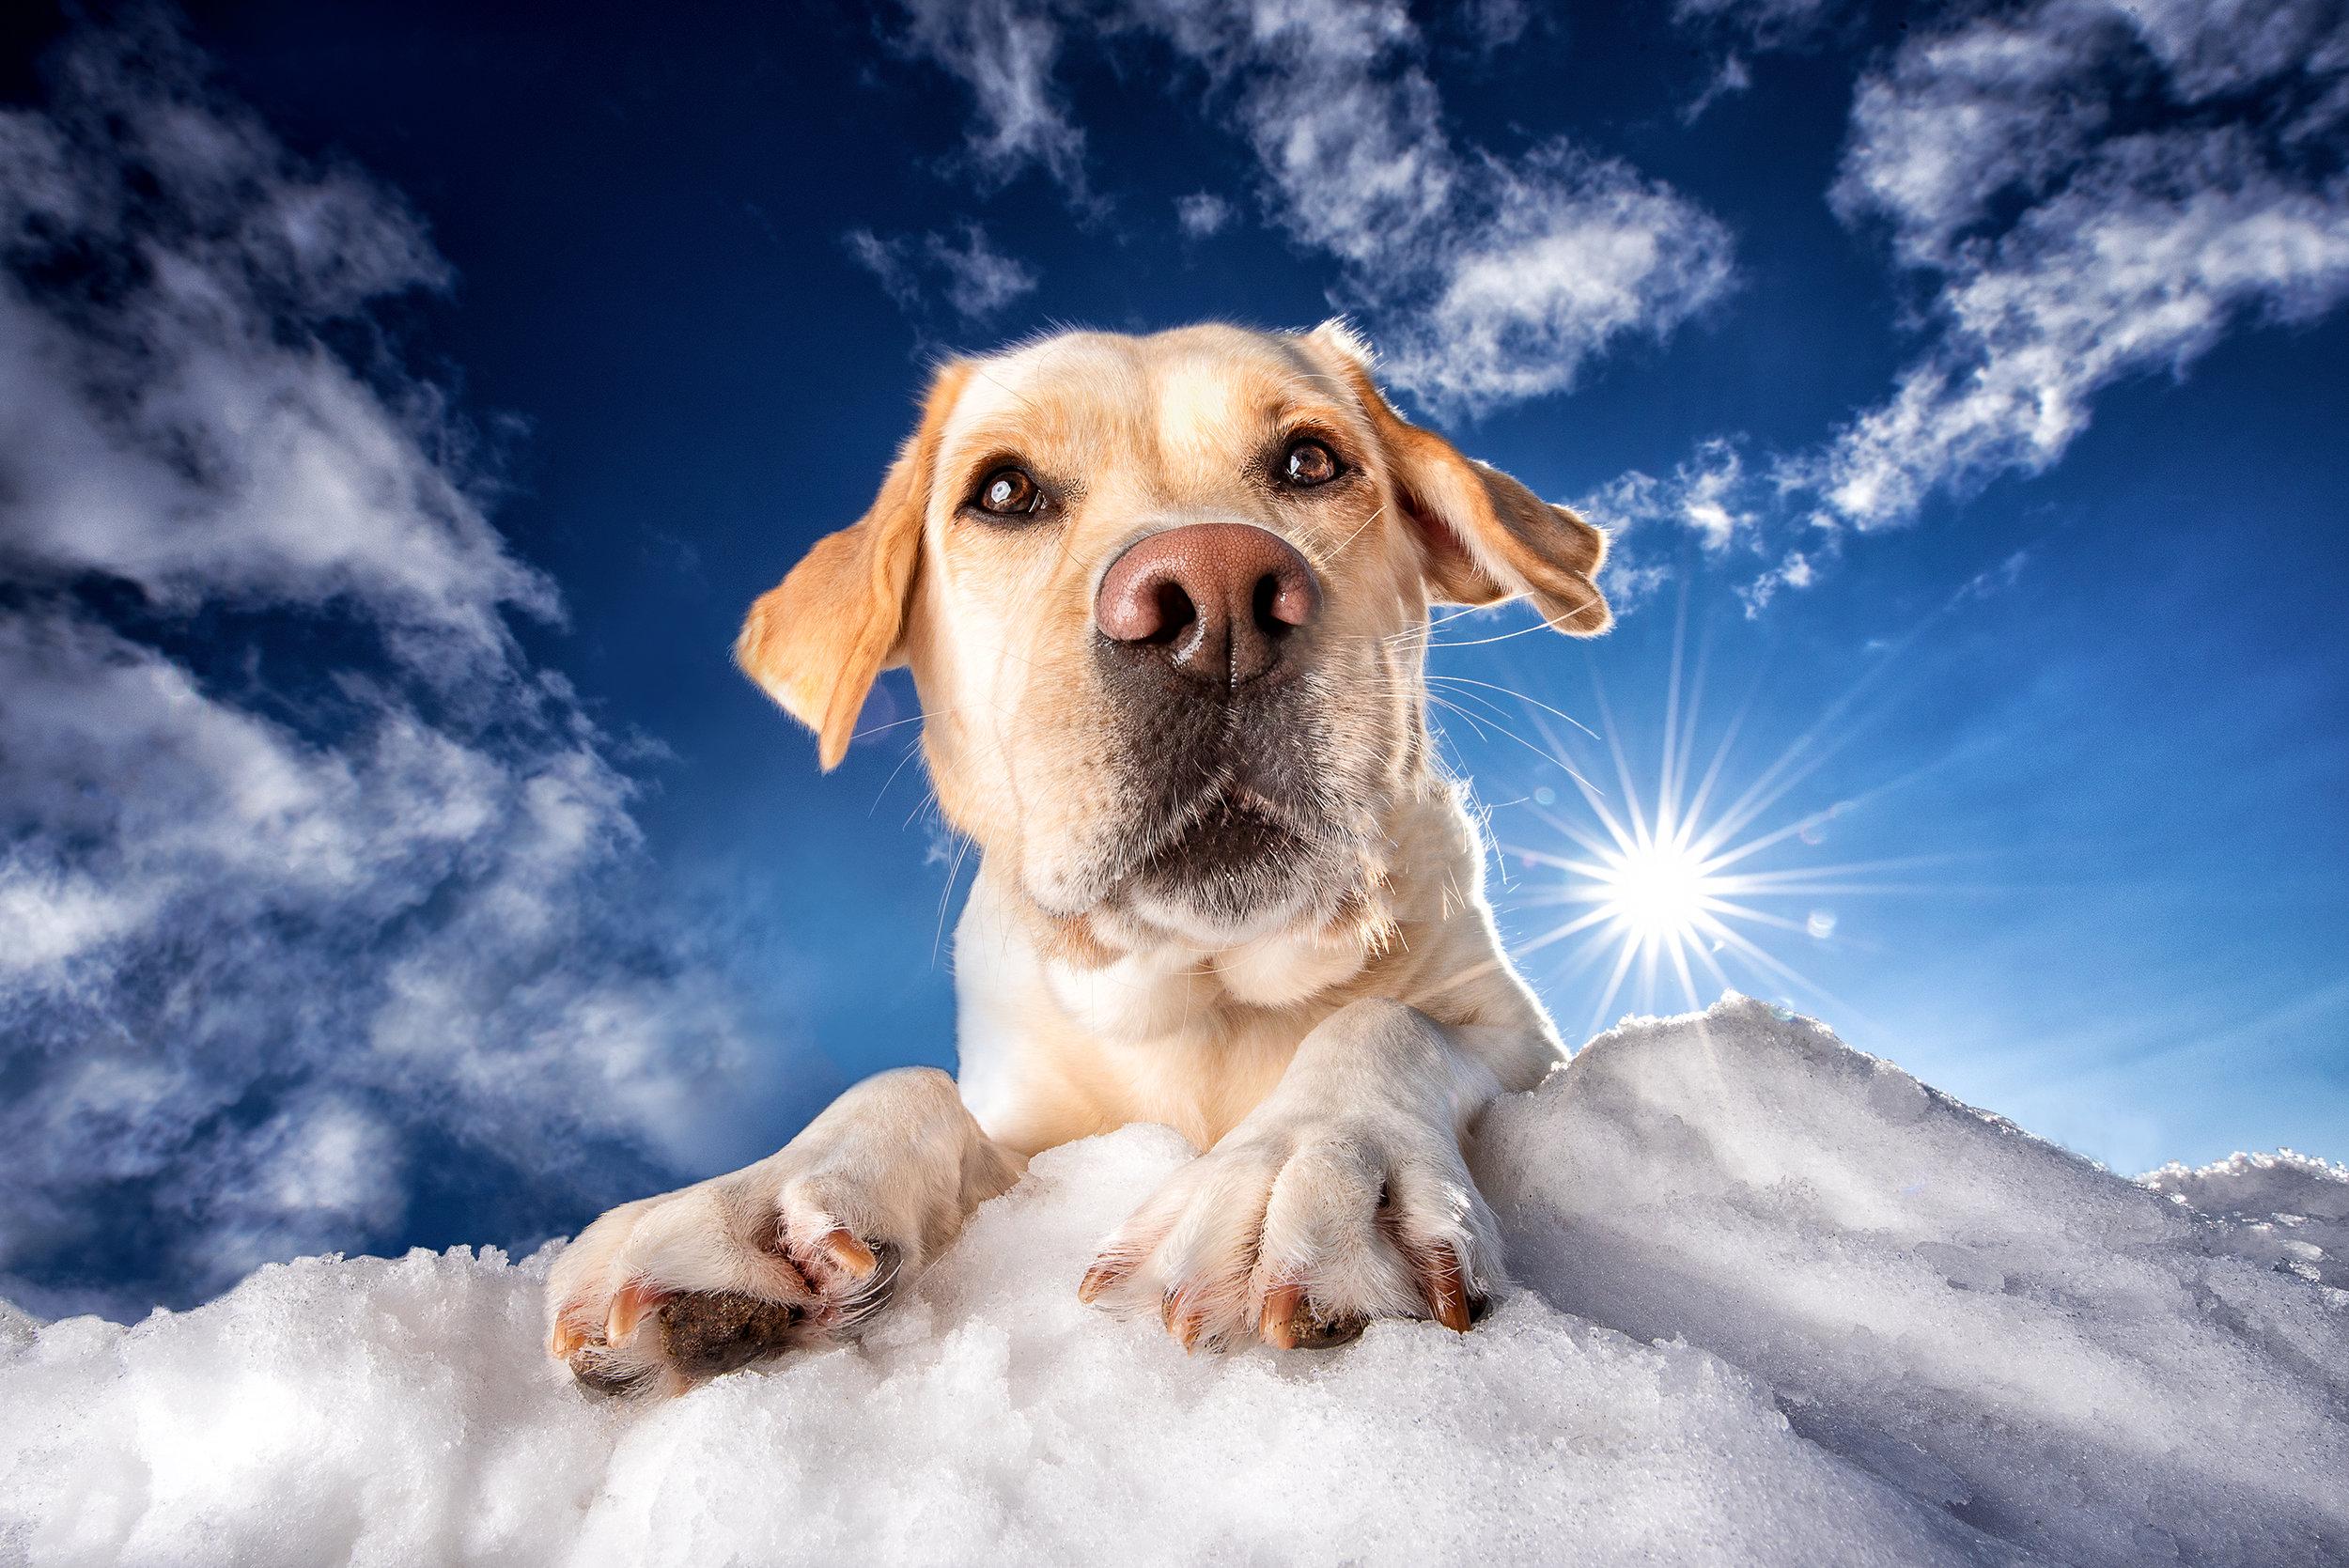 Salt Photography - Ottawa pet photographer - Dog Photographer Ottawa - Pet Photographer Ottawa - Ottawa photographer - Animal Photographer Ottawa.jpg